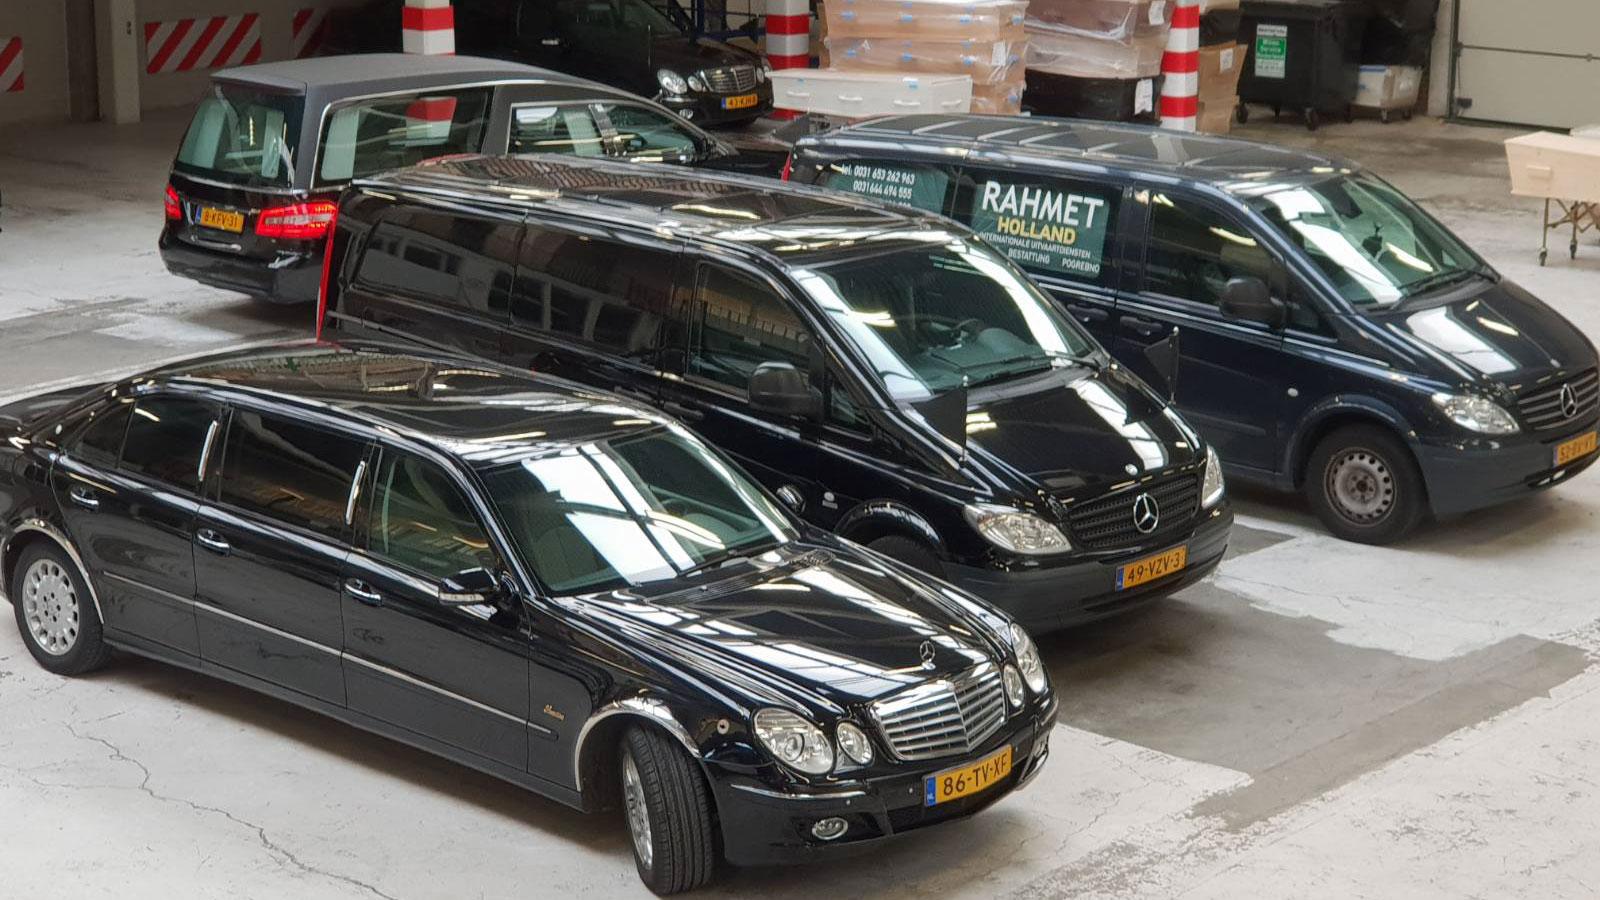 RAHMETHOLLAND-Internacionalni-transport-umrlih-u-Europi